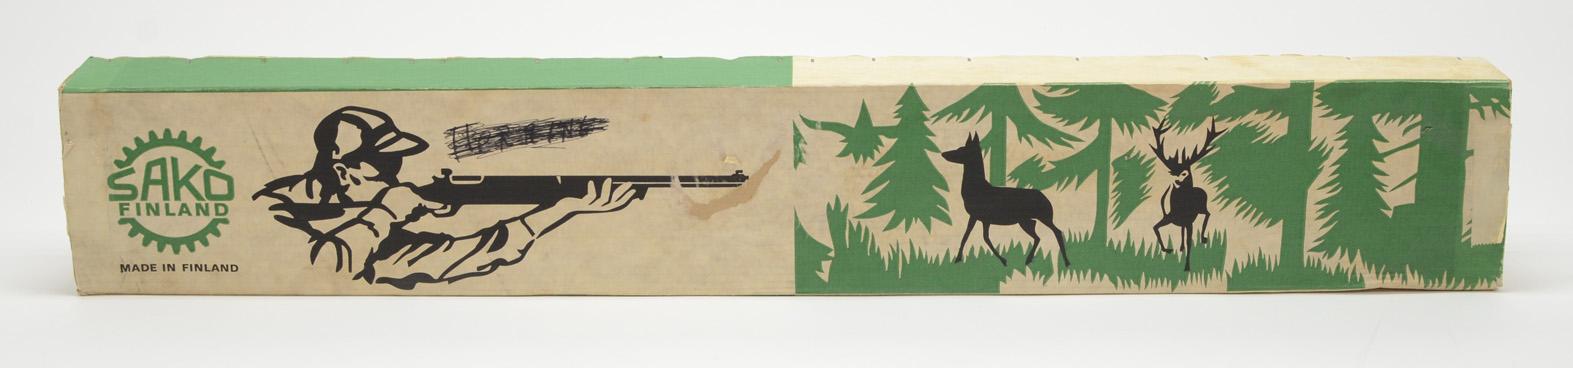 Sako Vintage Box